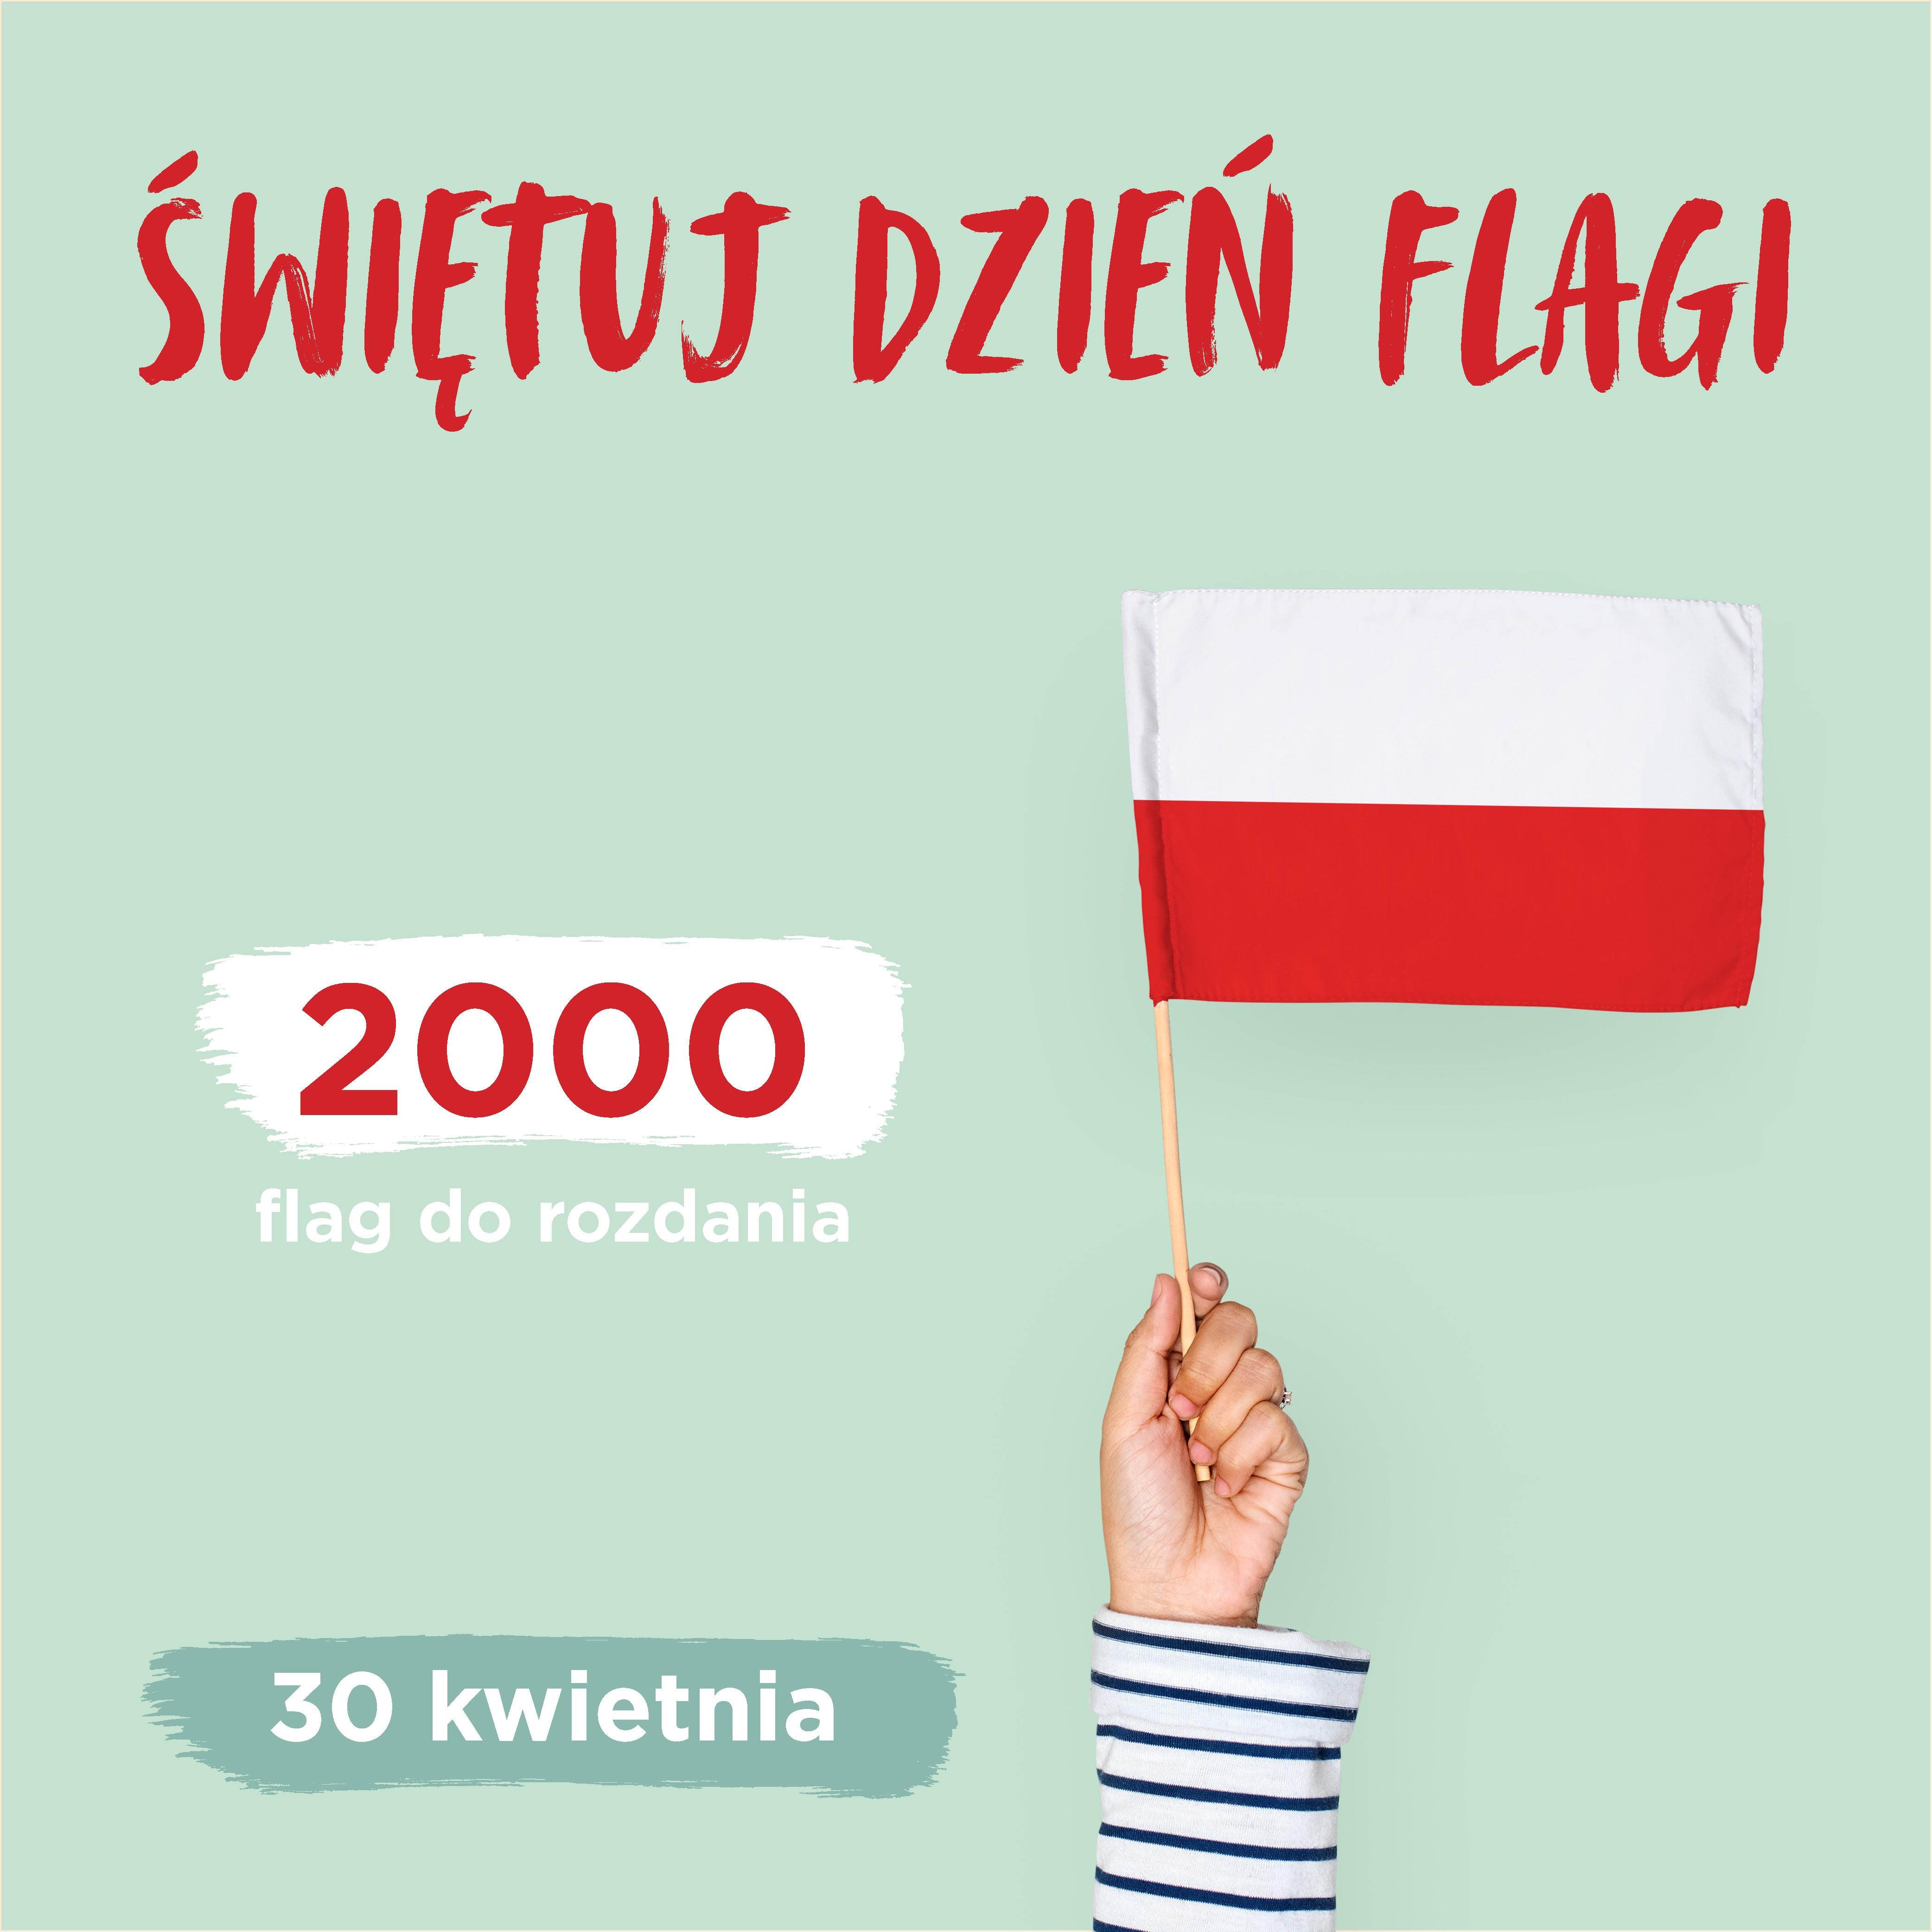 2000 Polish flag for free!